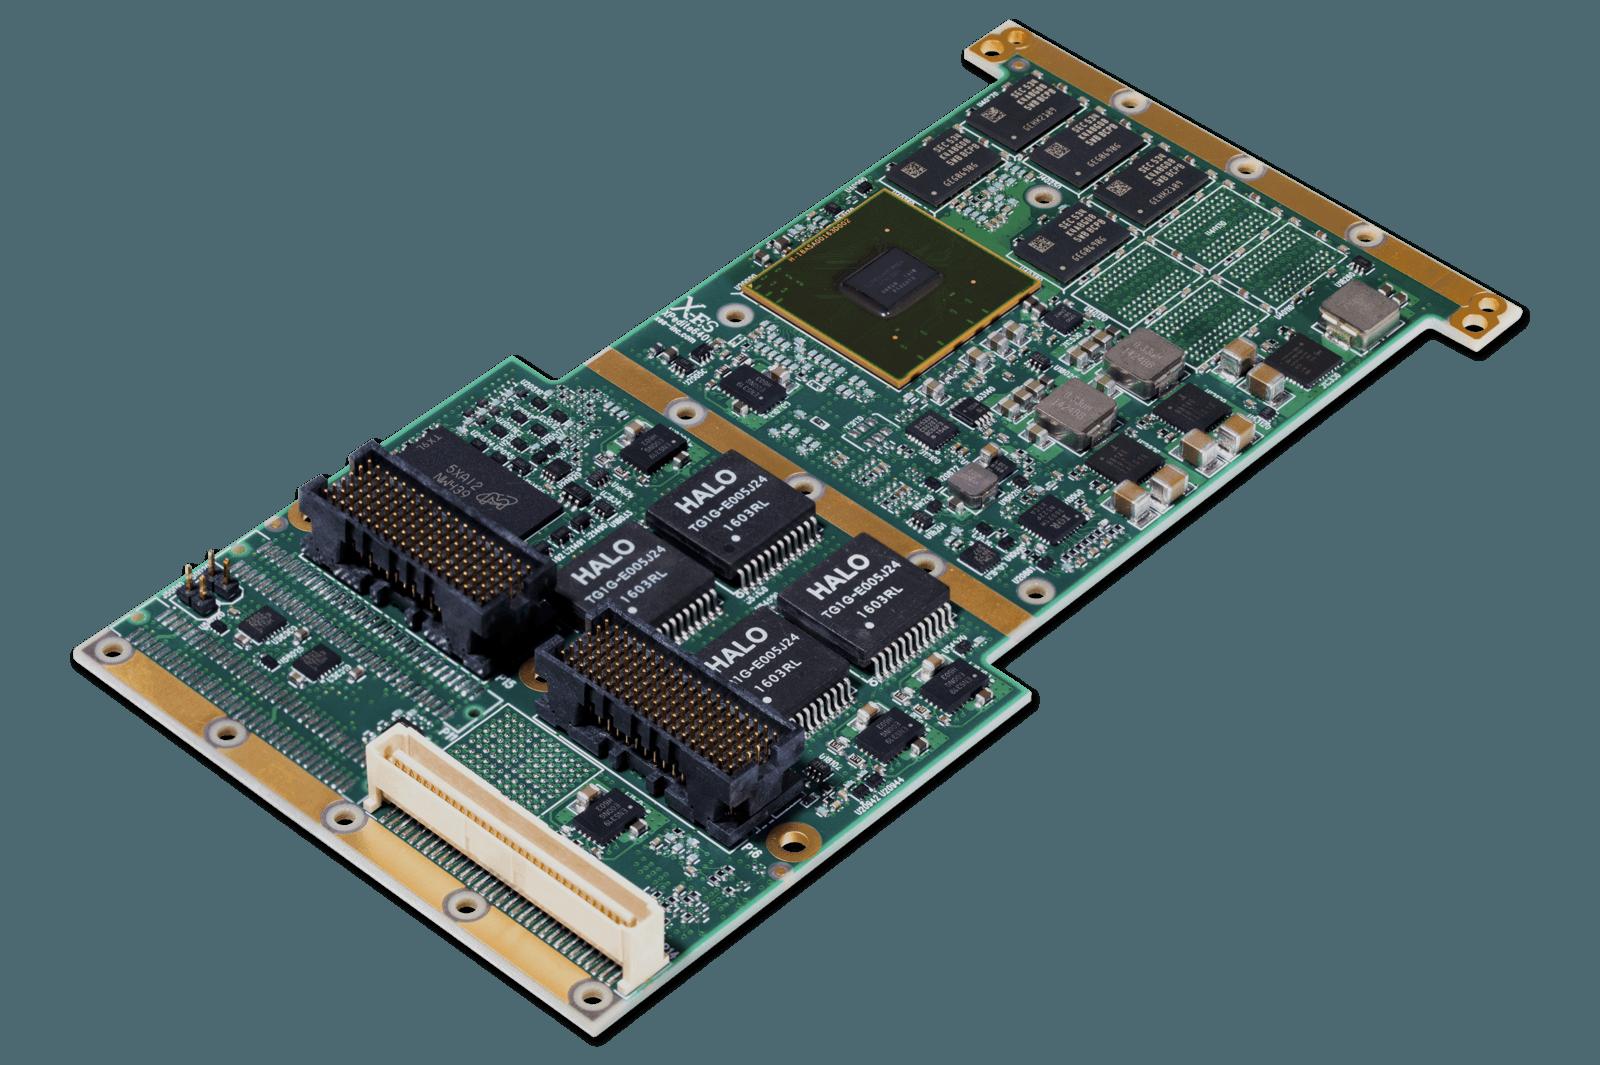 XPedite6401 XMC/PrPMC Mezzanine Module